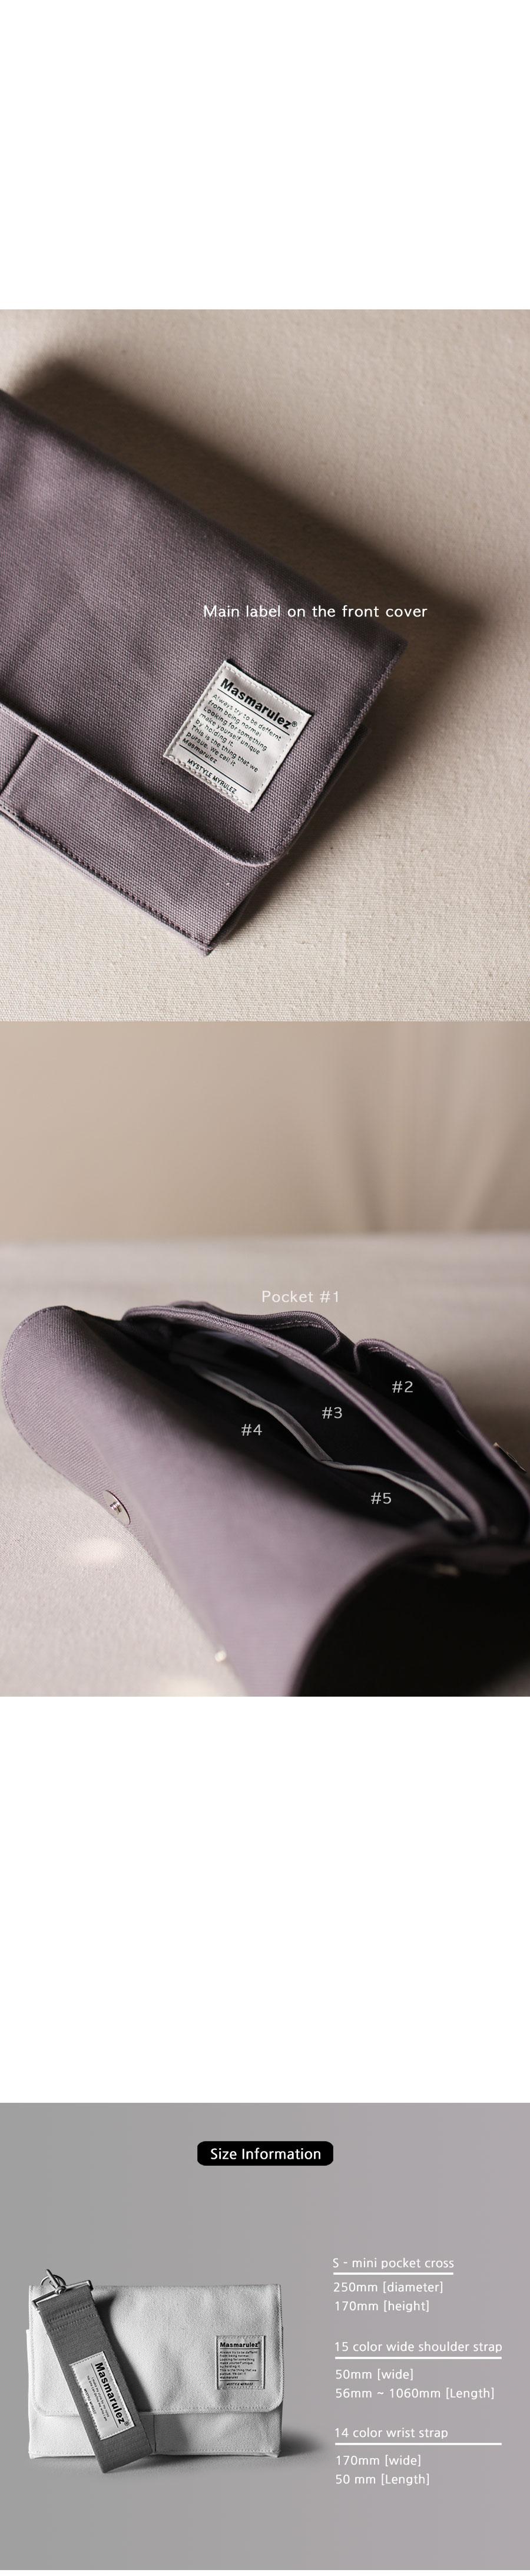 s-mini-pocket-gray-5.jpg